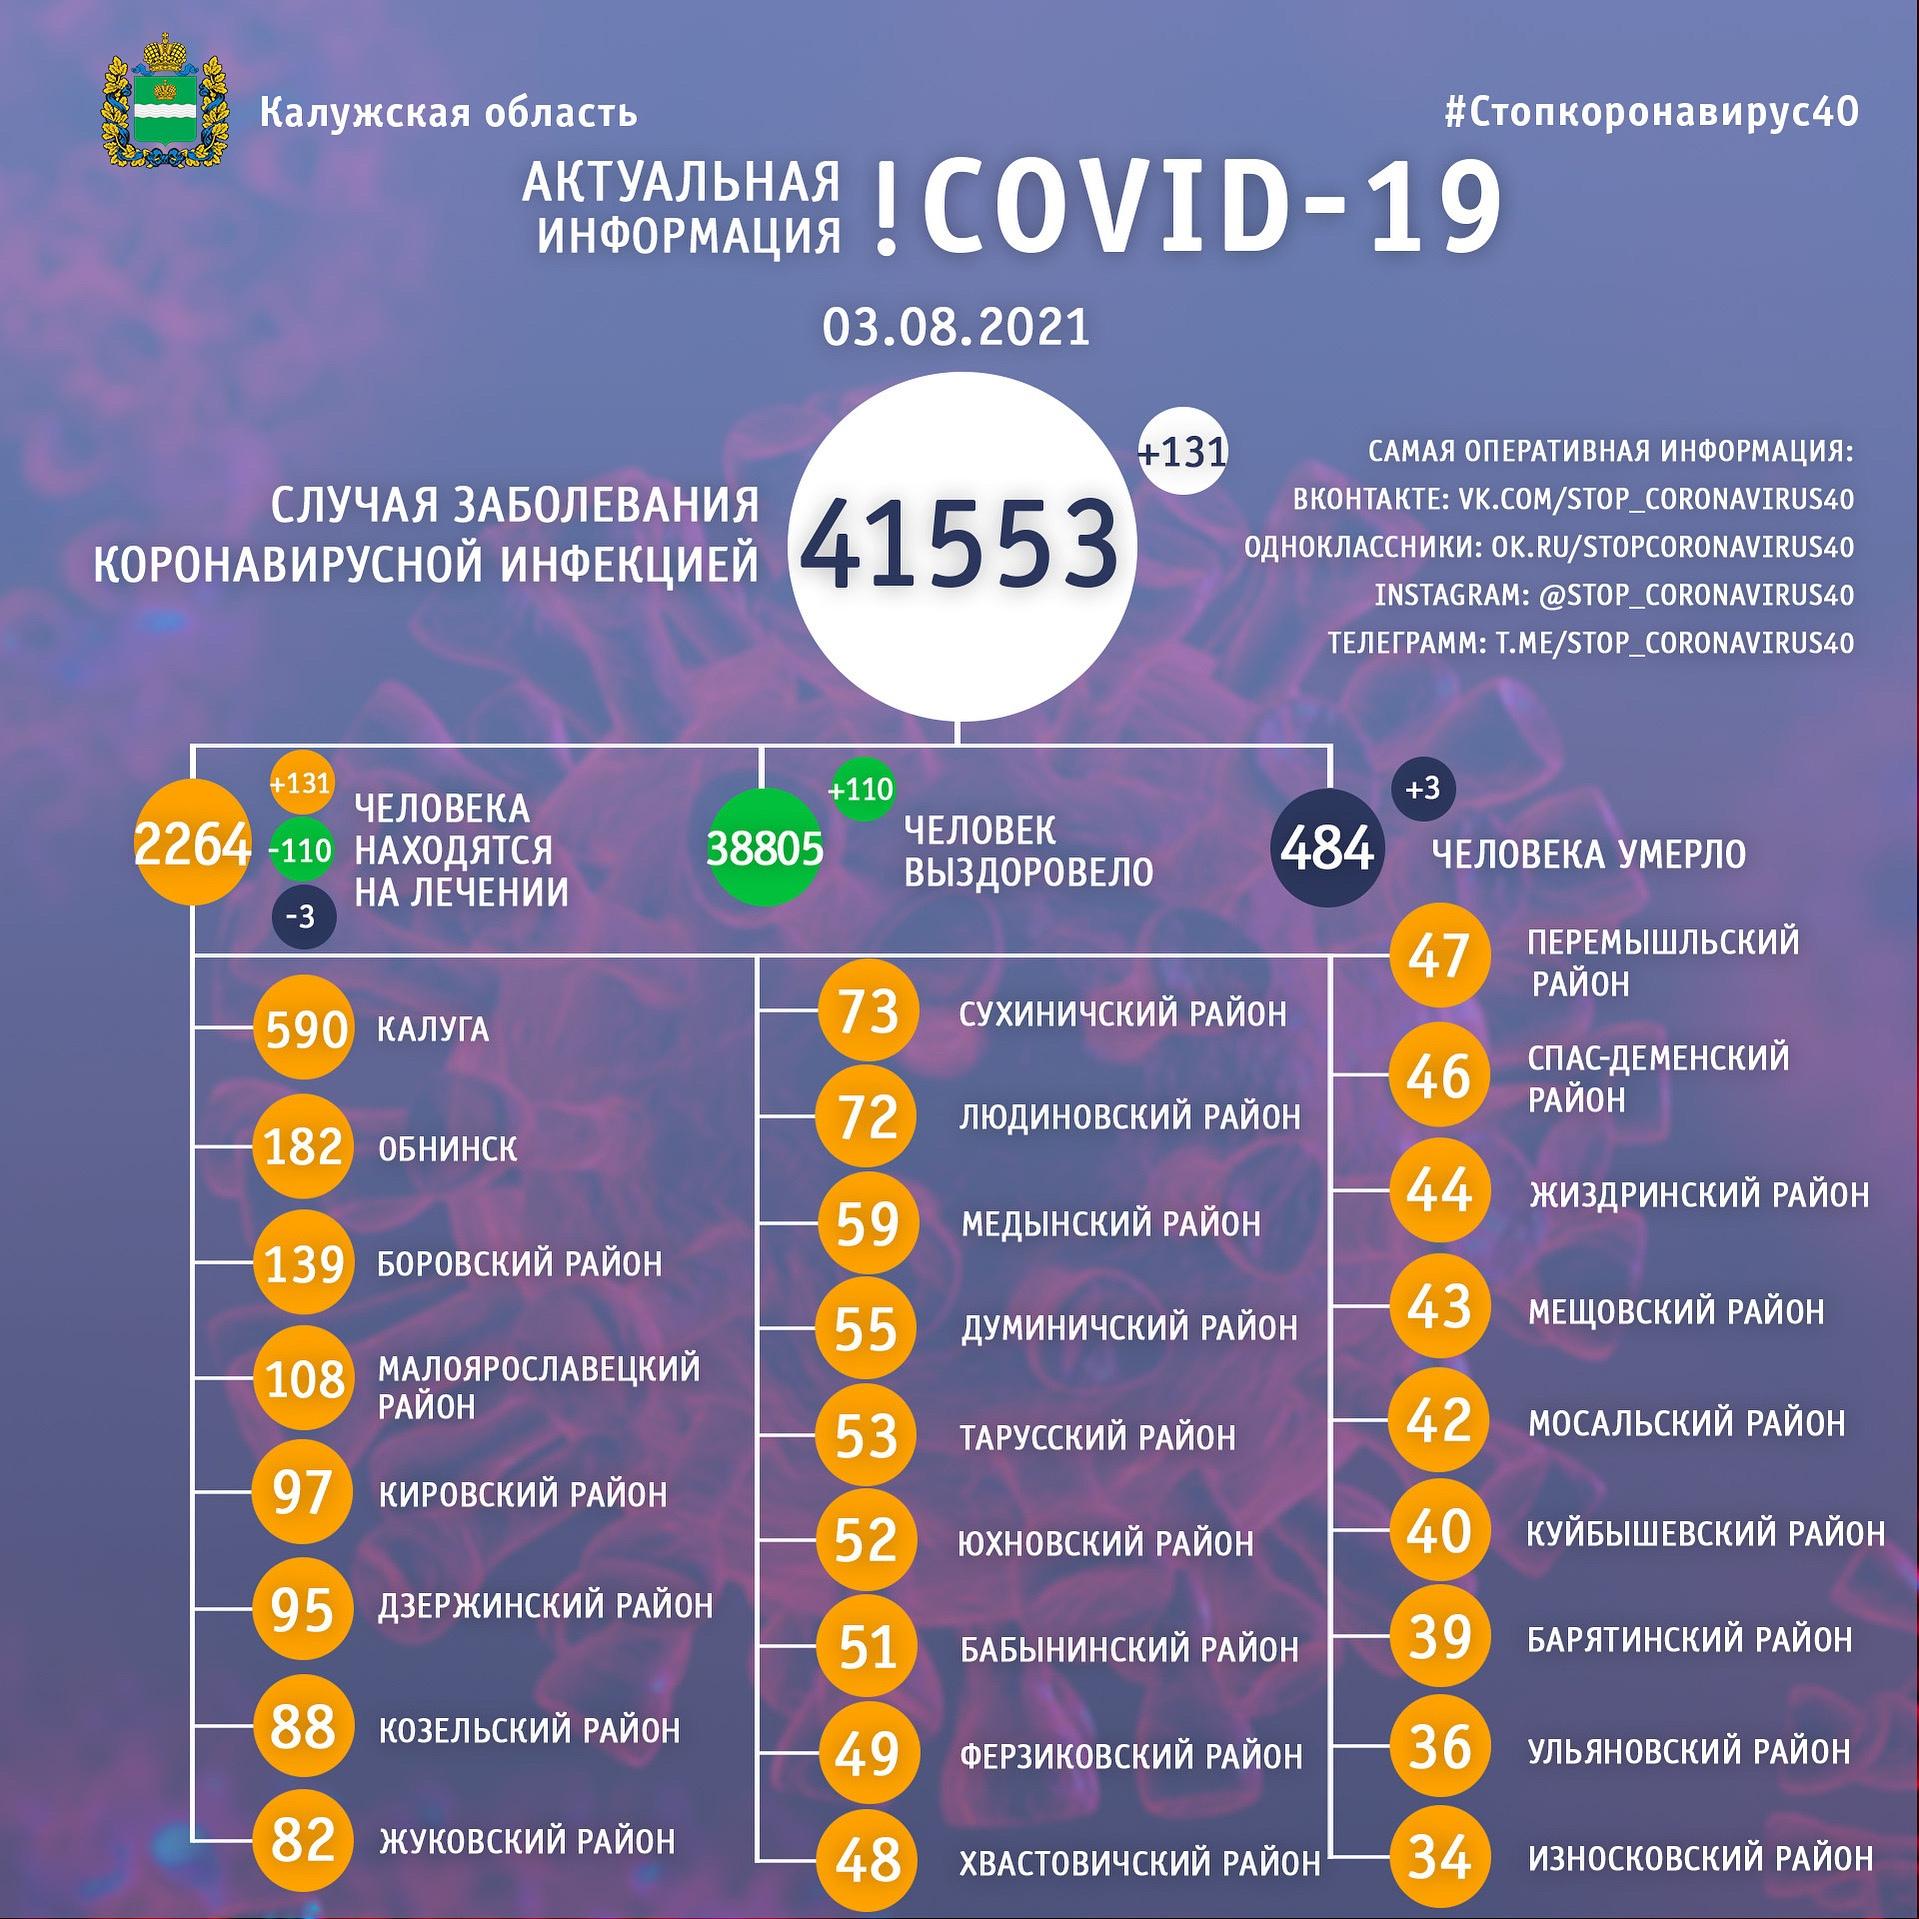 Официальная статистика по коронавирусу в Калужской области на 3 августа 2021 года.